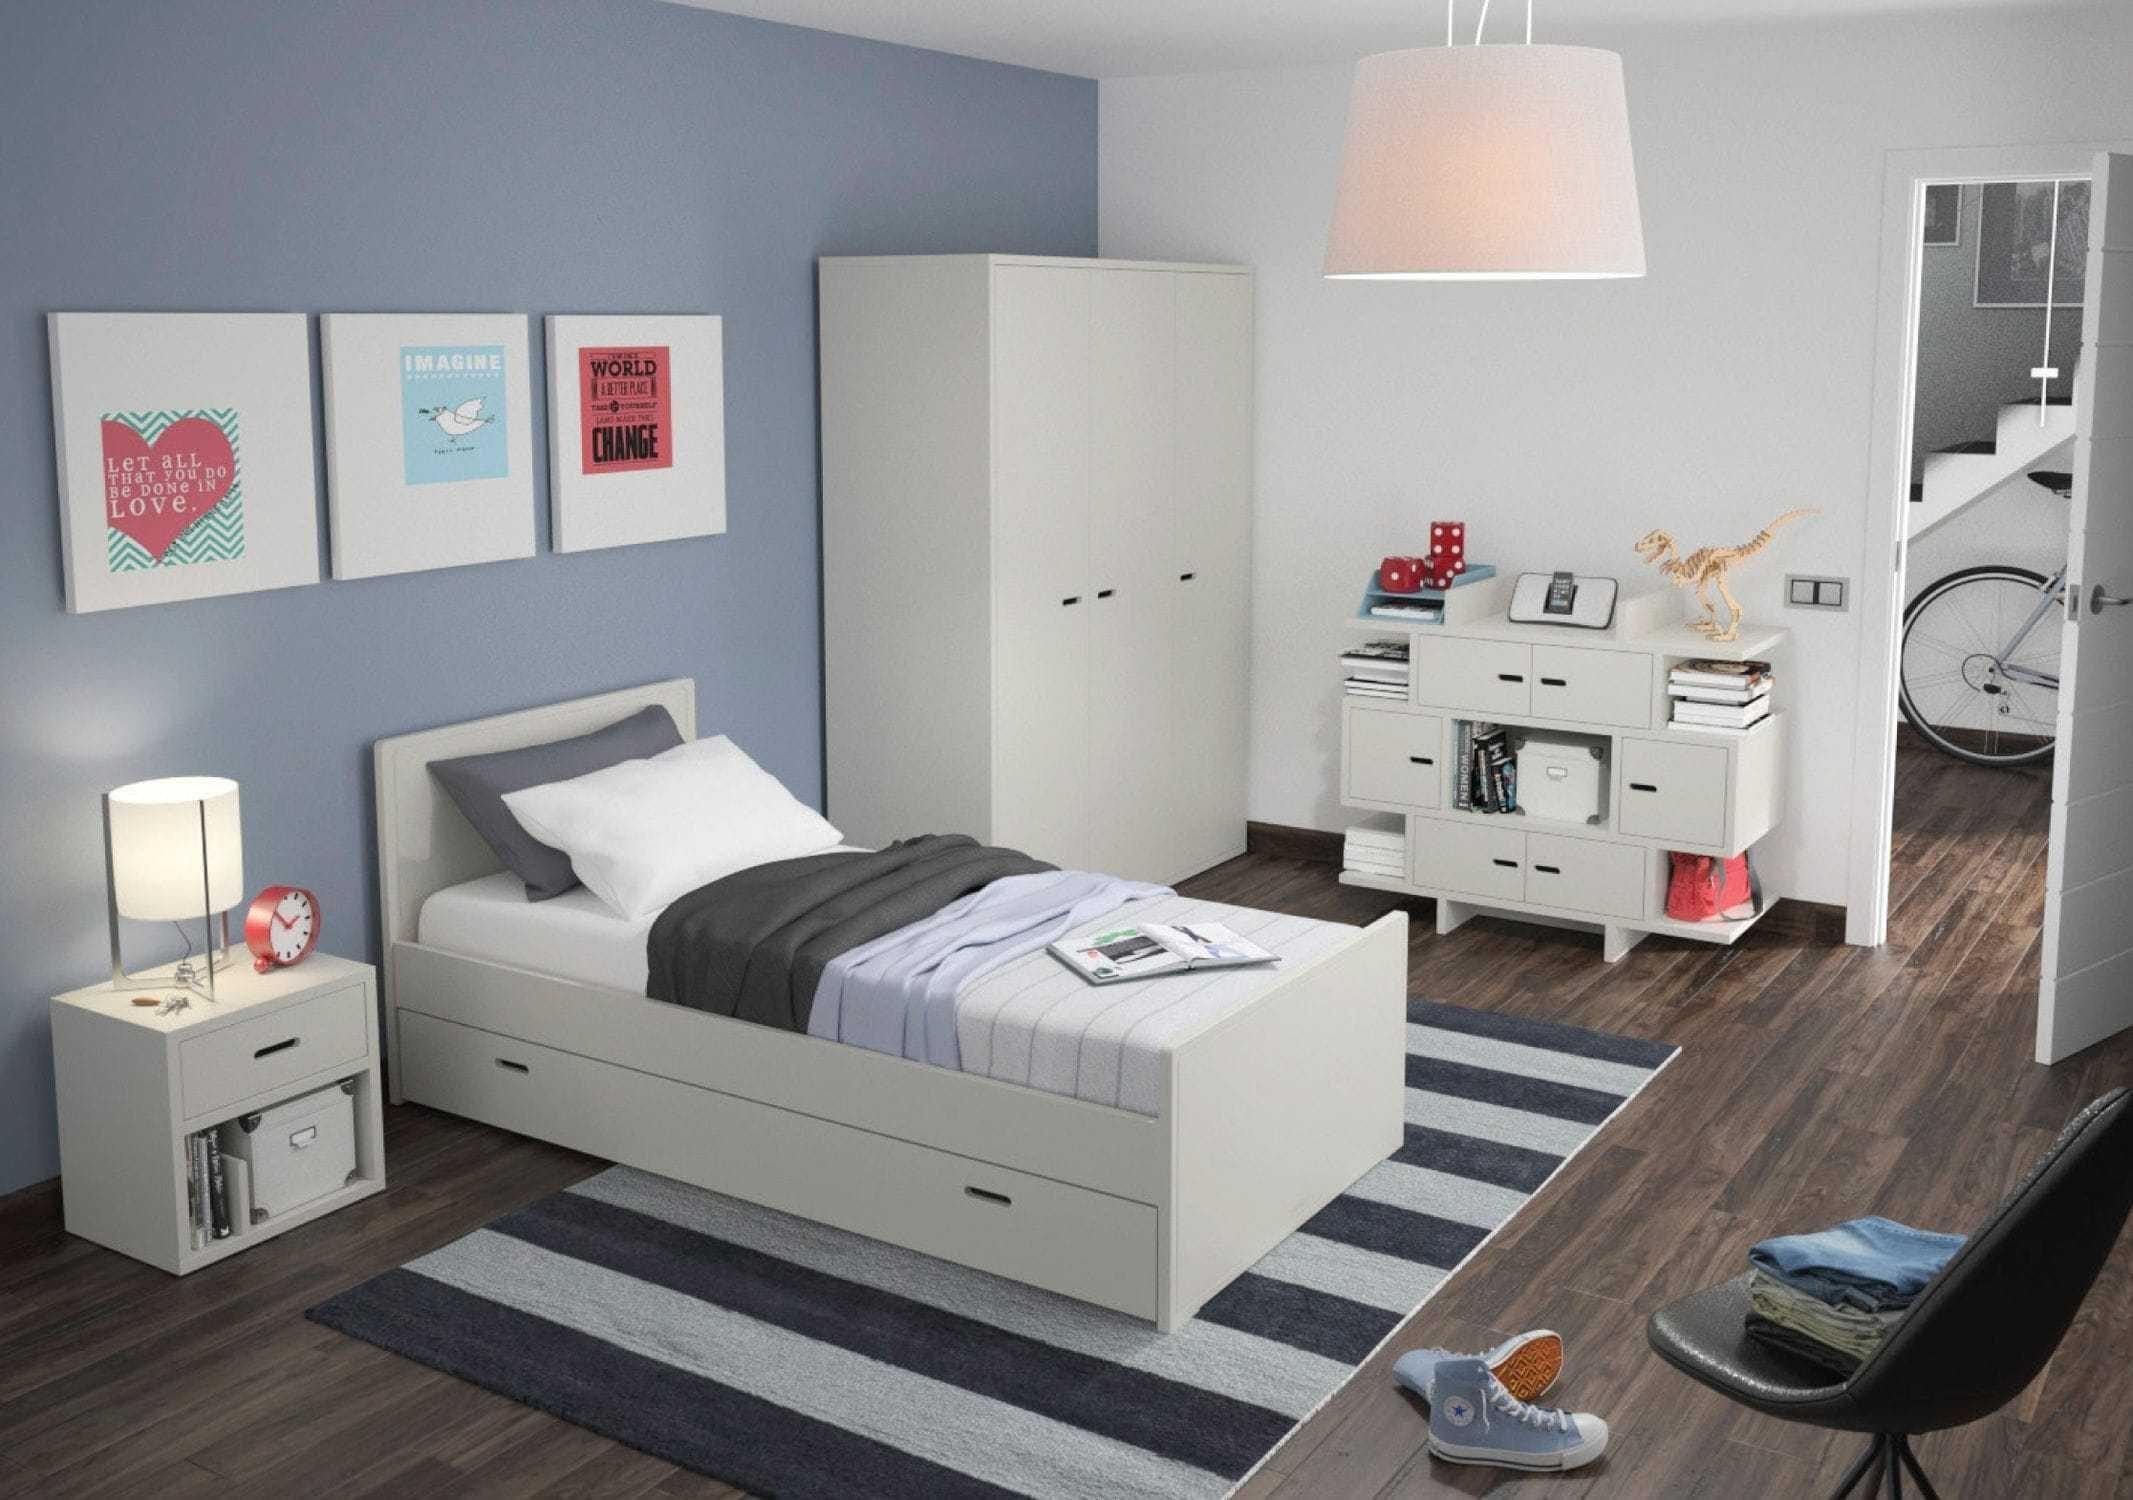 Toddlers Bedroom Furniture Set Best Of 15 Lovely Childrens Bedroom Furniture Sets Ideas